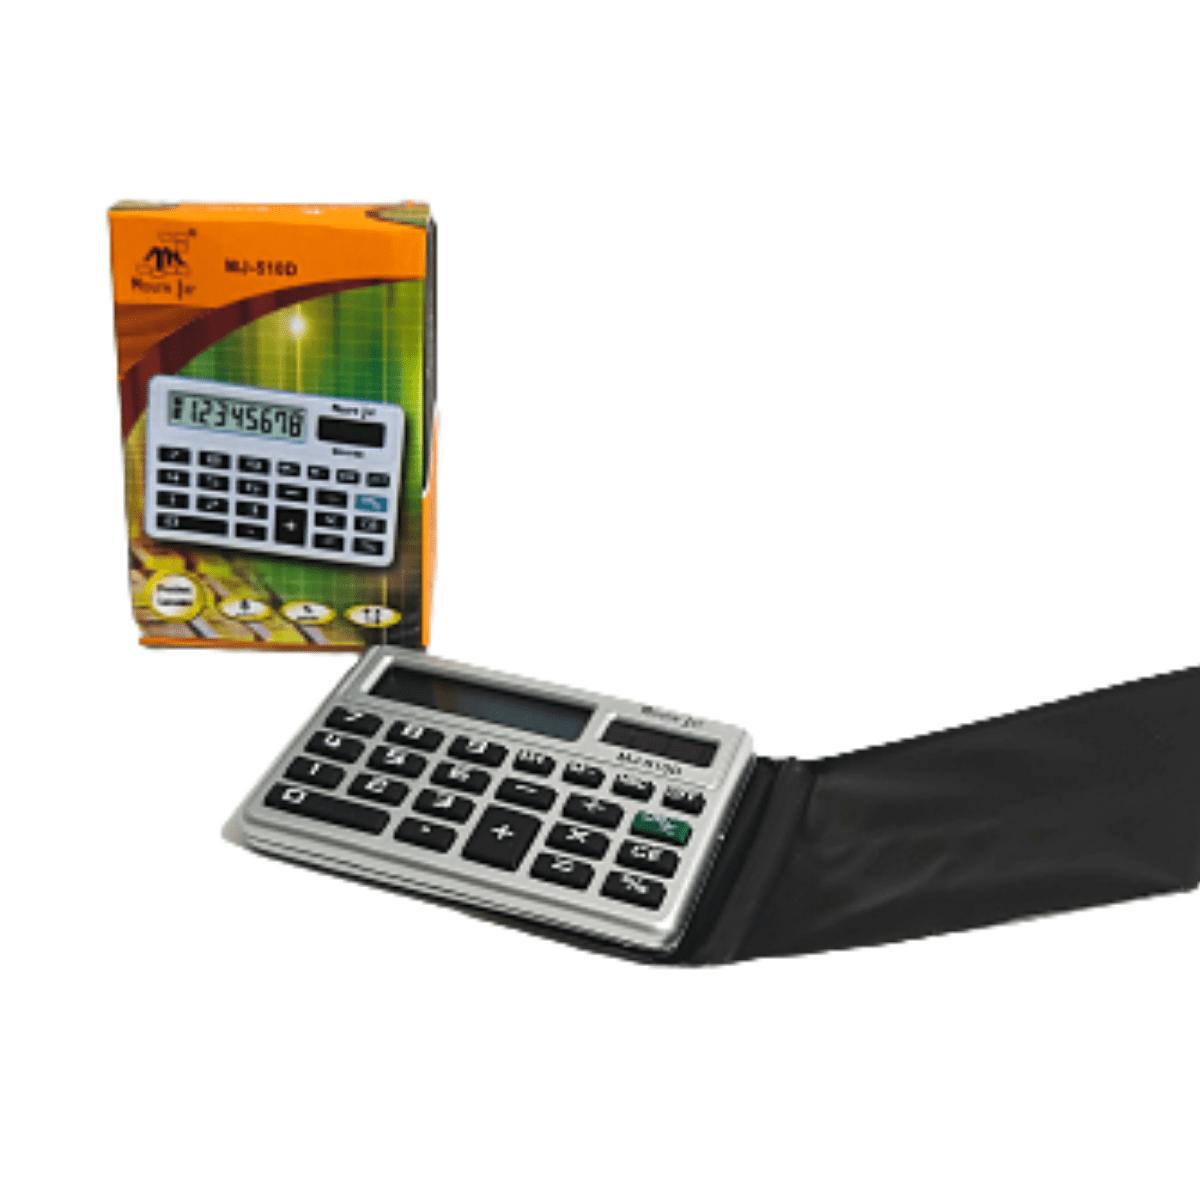 Calculadora de bolso Mini Portátil Eletrônica 8 dígitos Mj - 510D